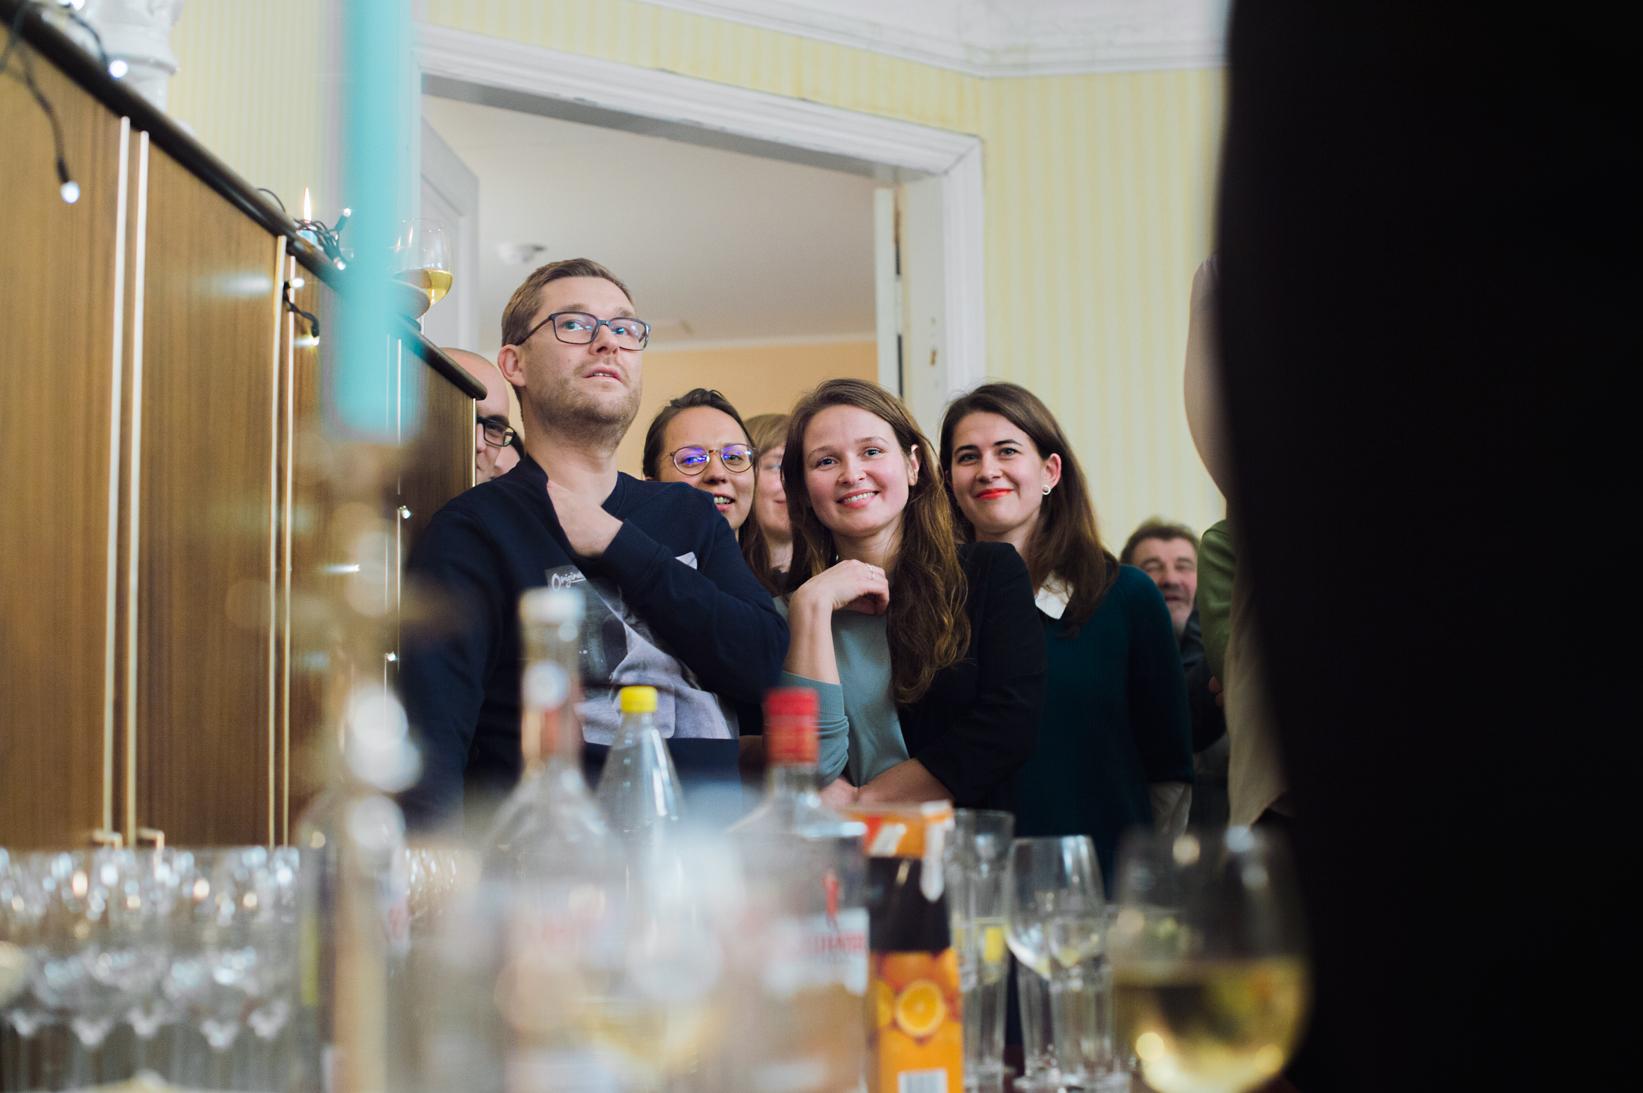 Ralf Siig, Elina Litvinova, Anna-Liisa Liiver, Evelin Soosaar-Penttilä